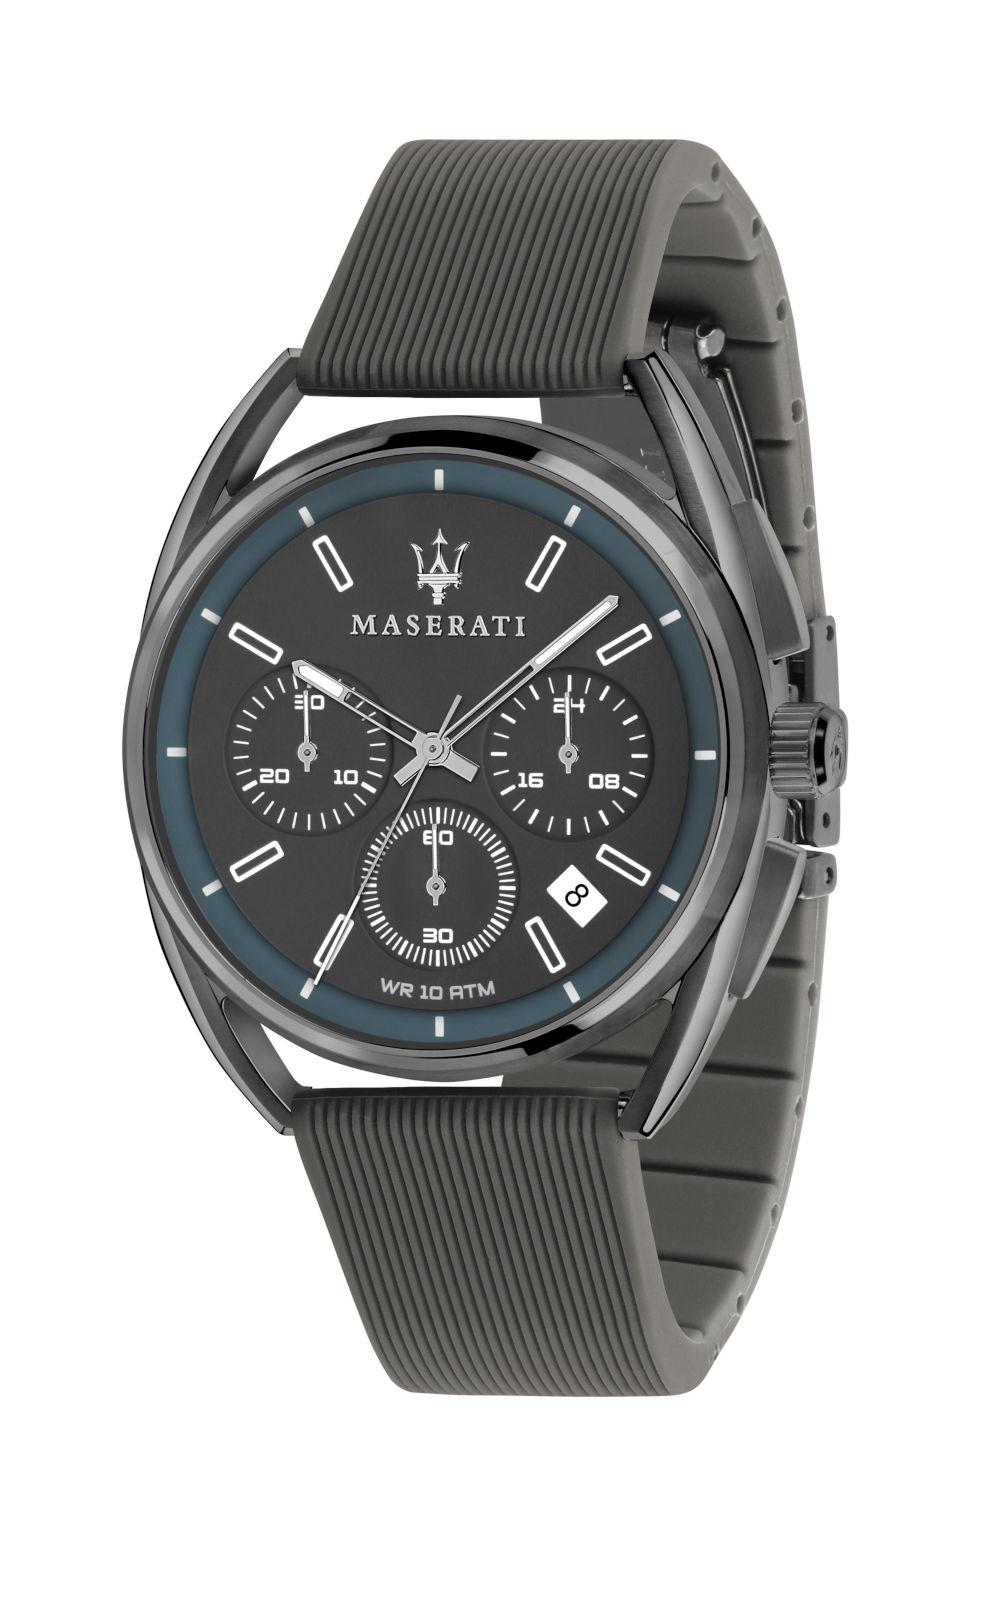 MASERATI TRIMARANO R8871632003 Ανδρικό Ρολόι Quartz Χρονογράφος Ακριβείας b509a75ea03